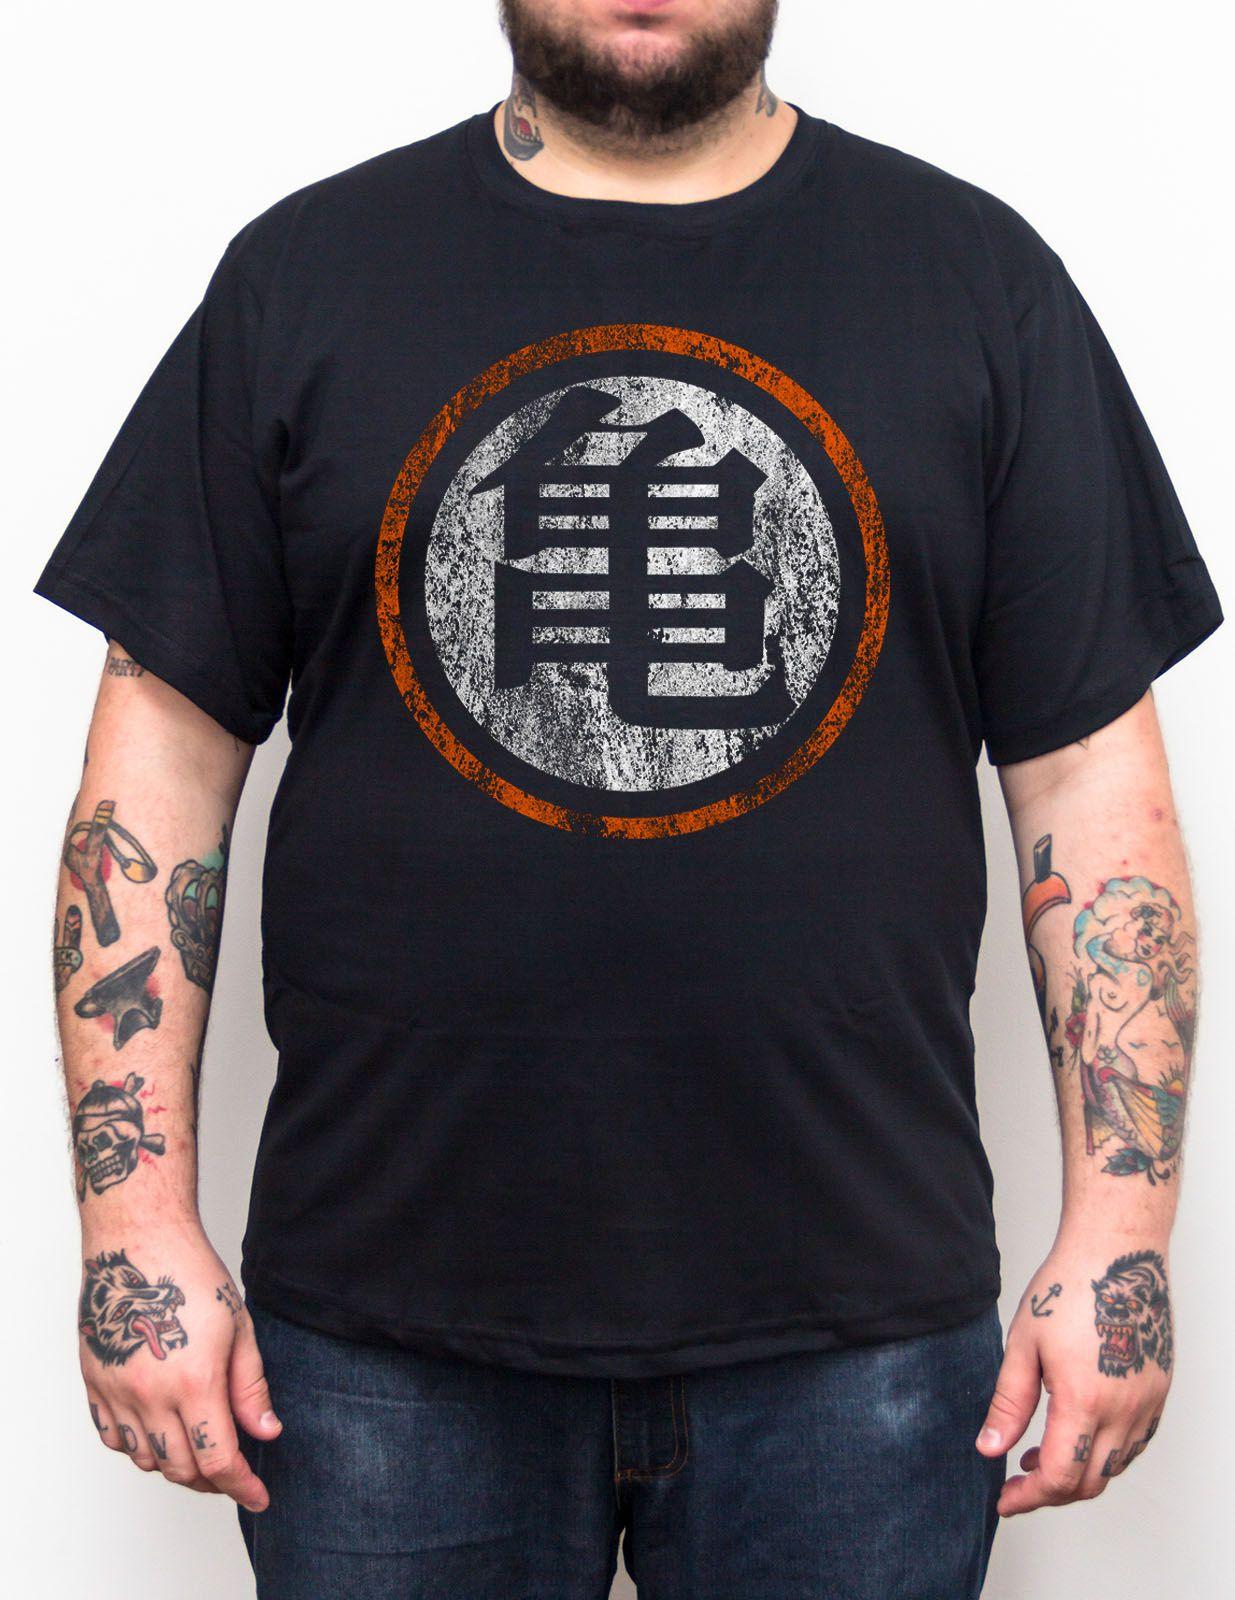 Camiseta Dragonball Logo - Plus Size - Tamanho XG  - HShop